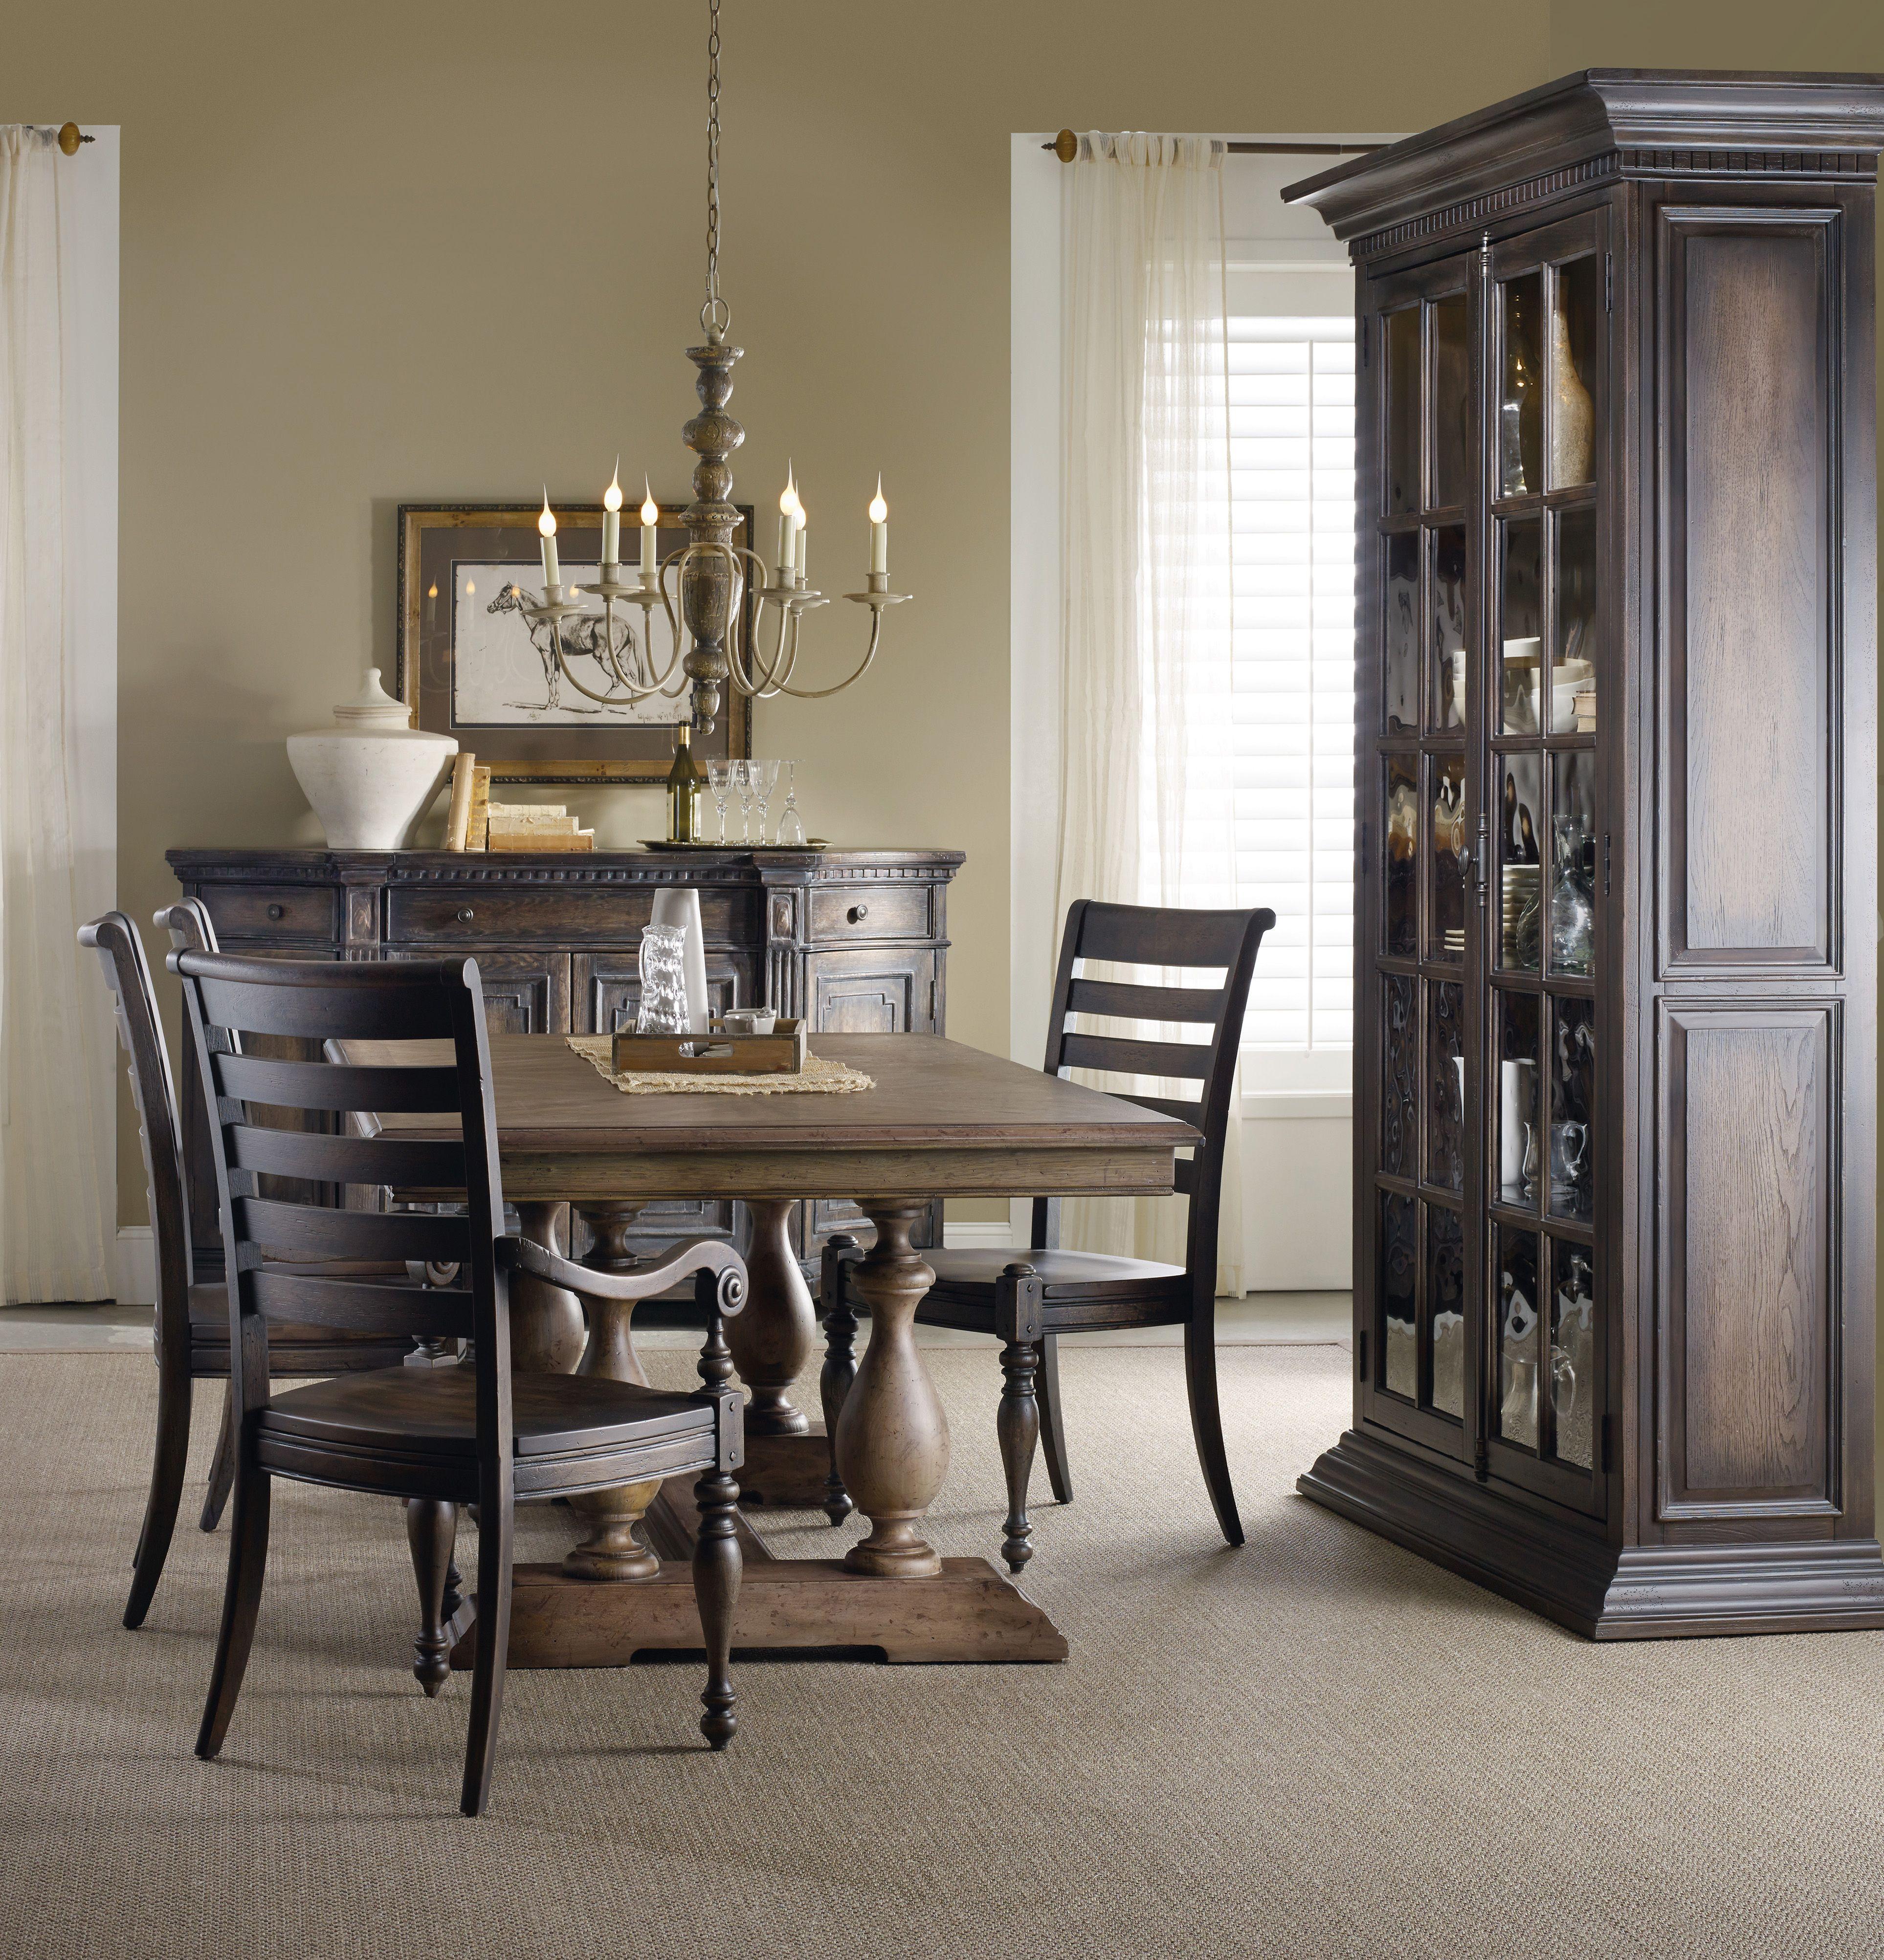 Wright Furniture U0026 Flooring In Hannibal, MO.